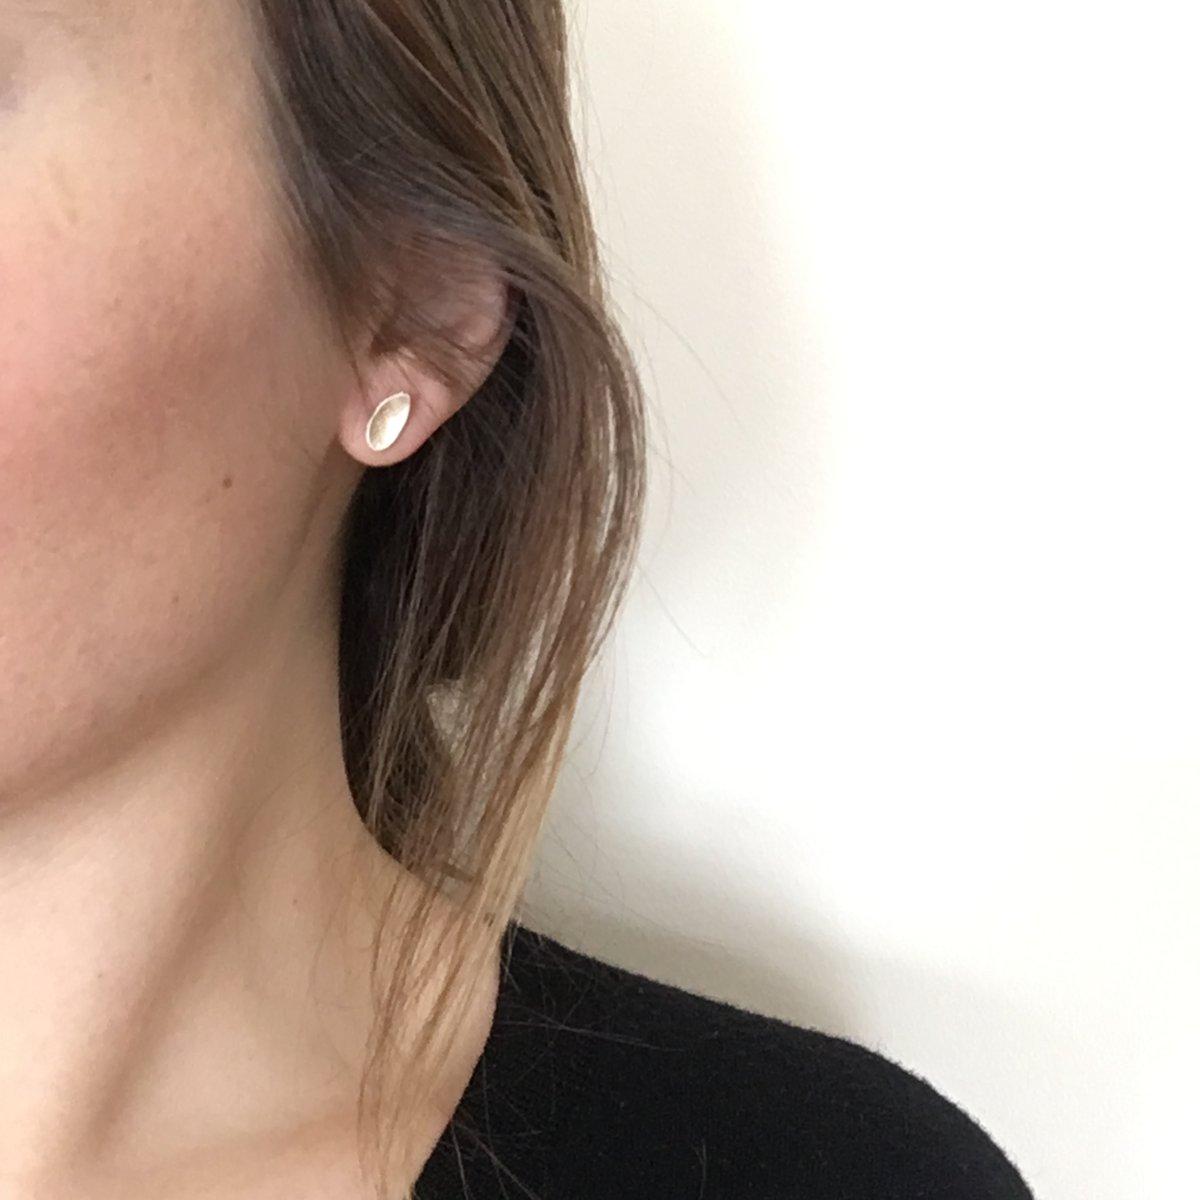 Image of pod earring